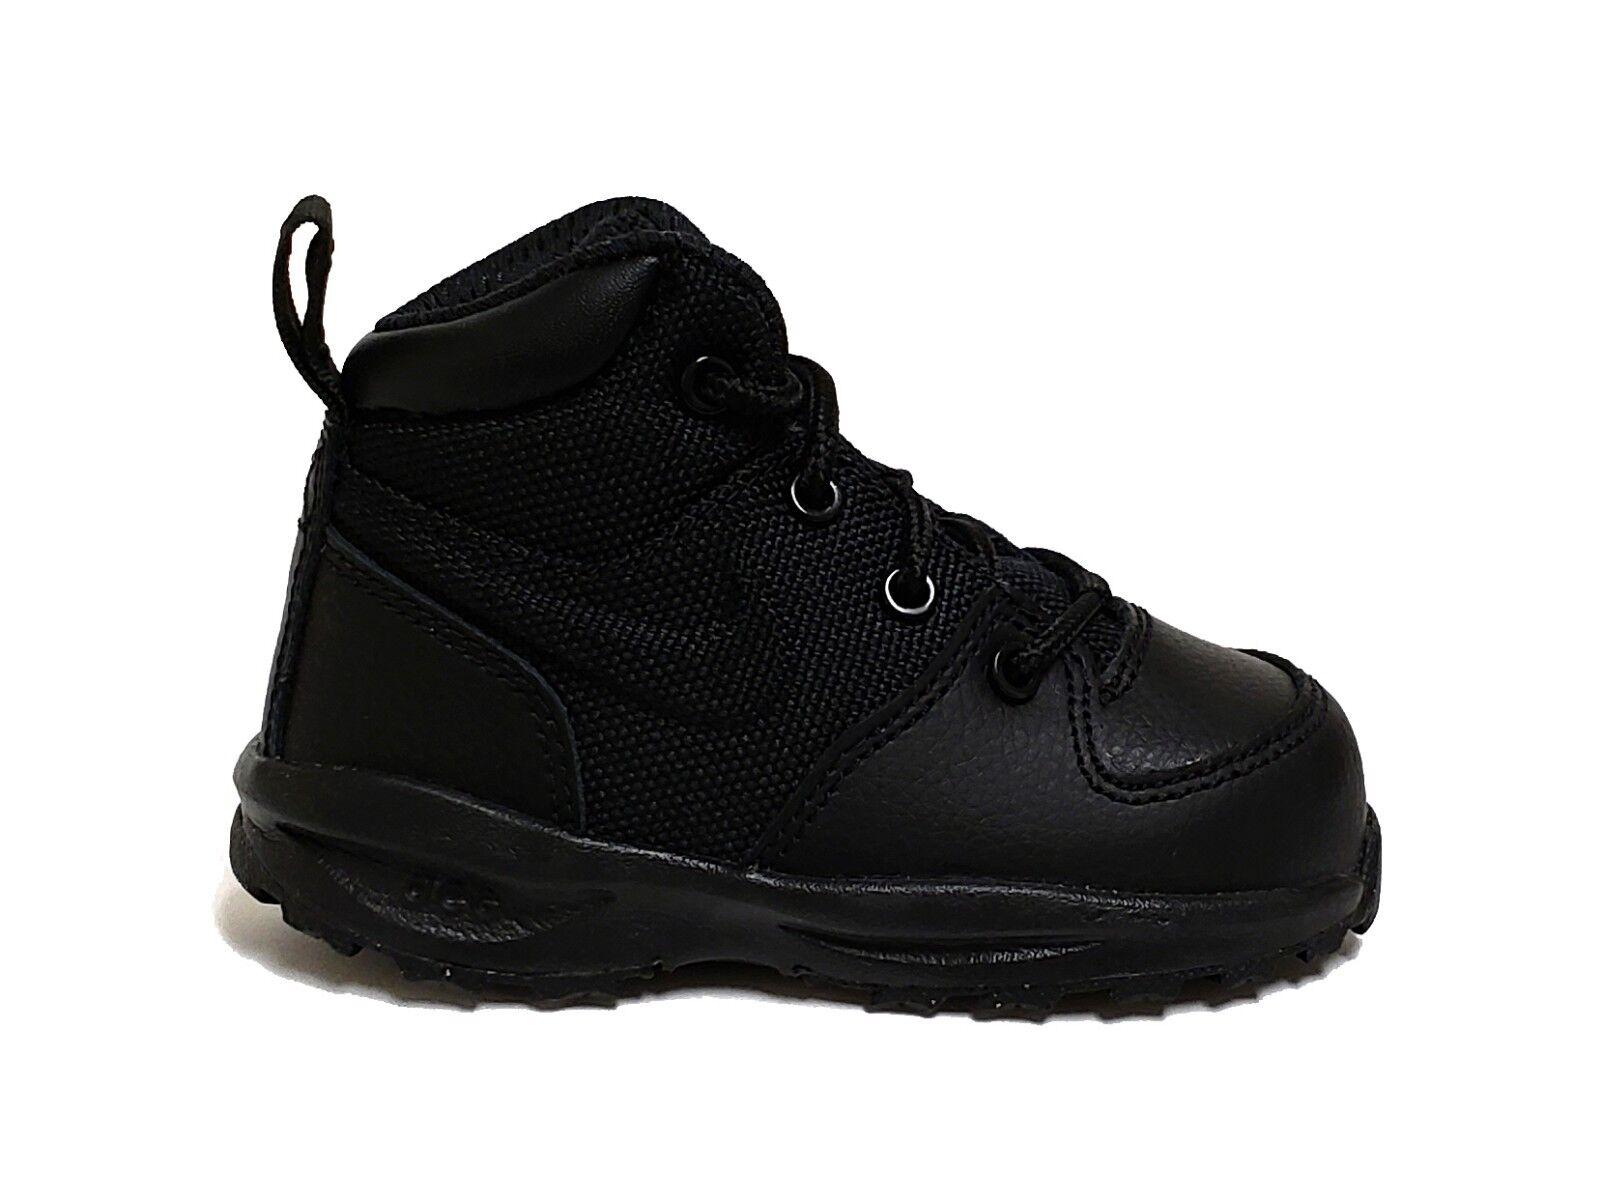 Nike Infant & Toddler's MANOA LTH TXT TD Shoes Black 613548-001 b